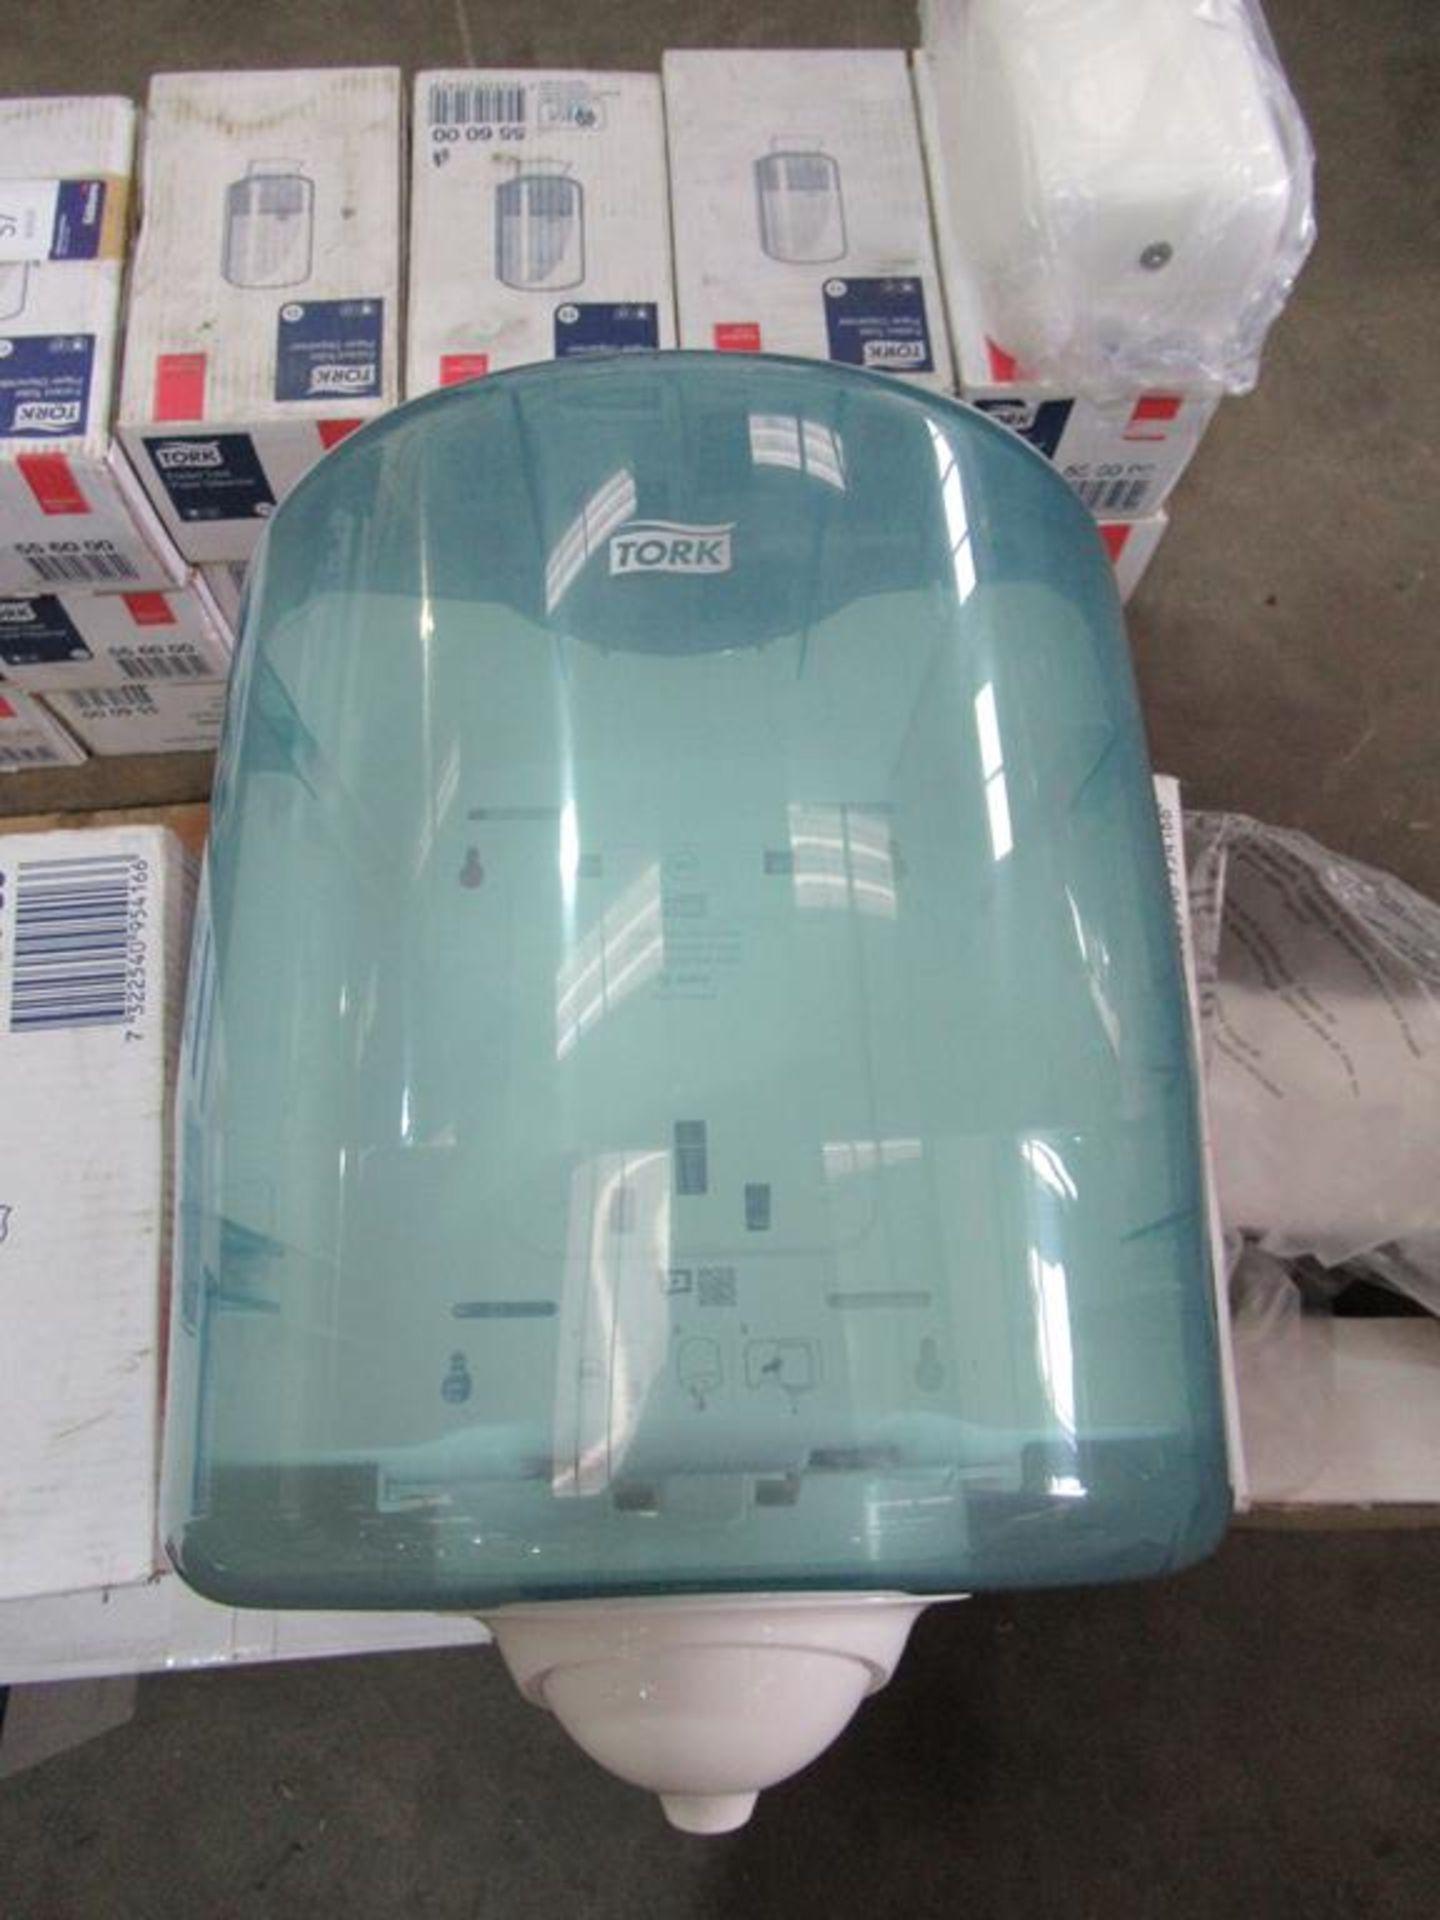 6 x New Tork Reflex Single Sheet White Roll Dispensers - Image 2 of 5